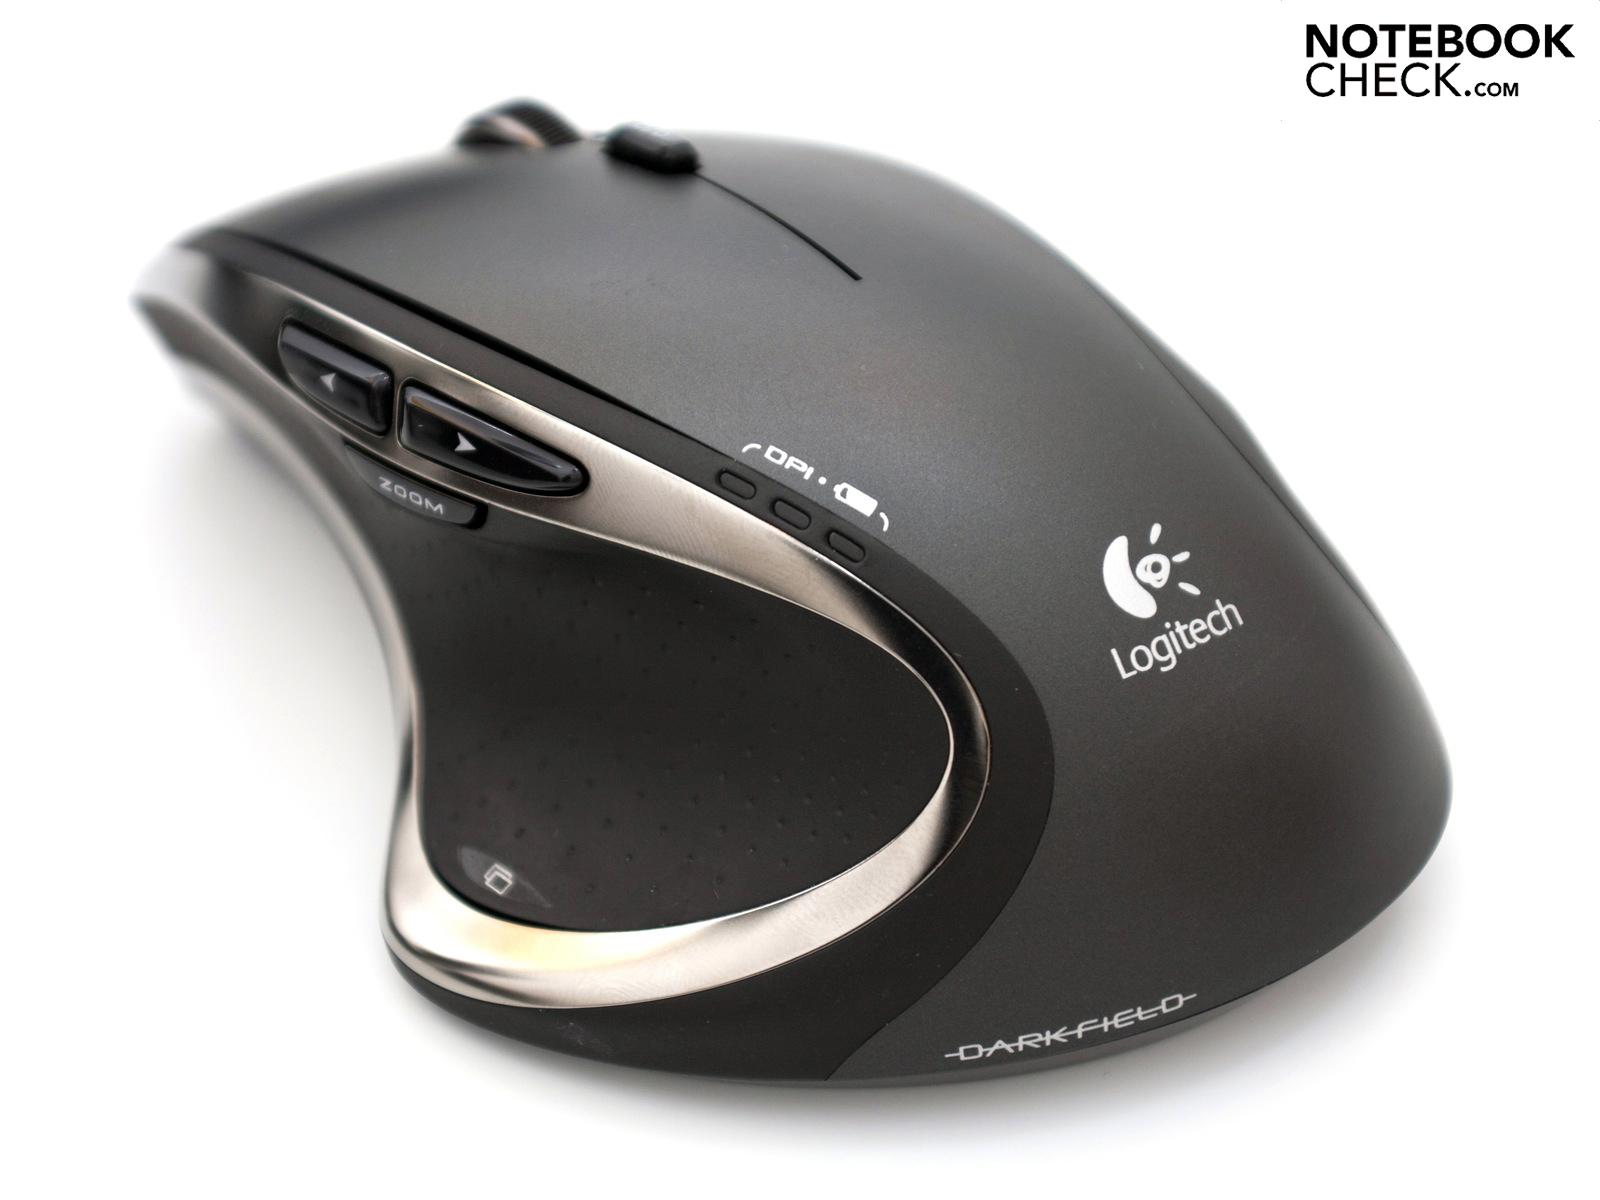 e27def8557a Review Logitech Performance Mouse MX - NotebookCheck.net Reviews